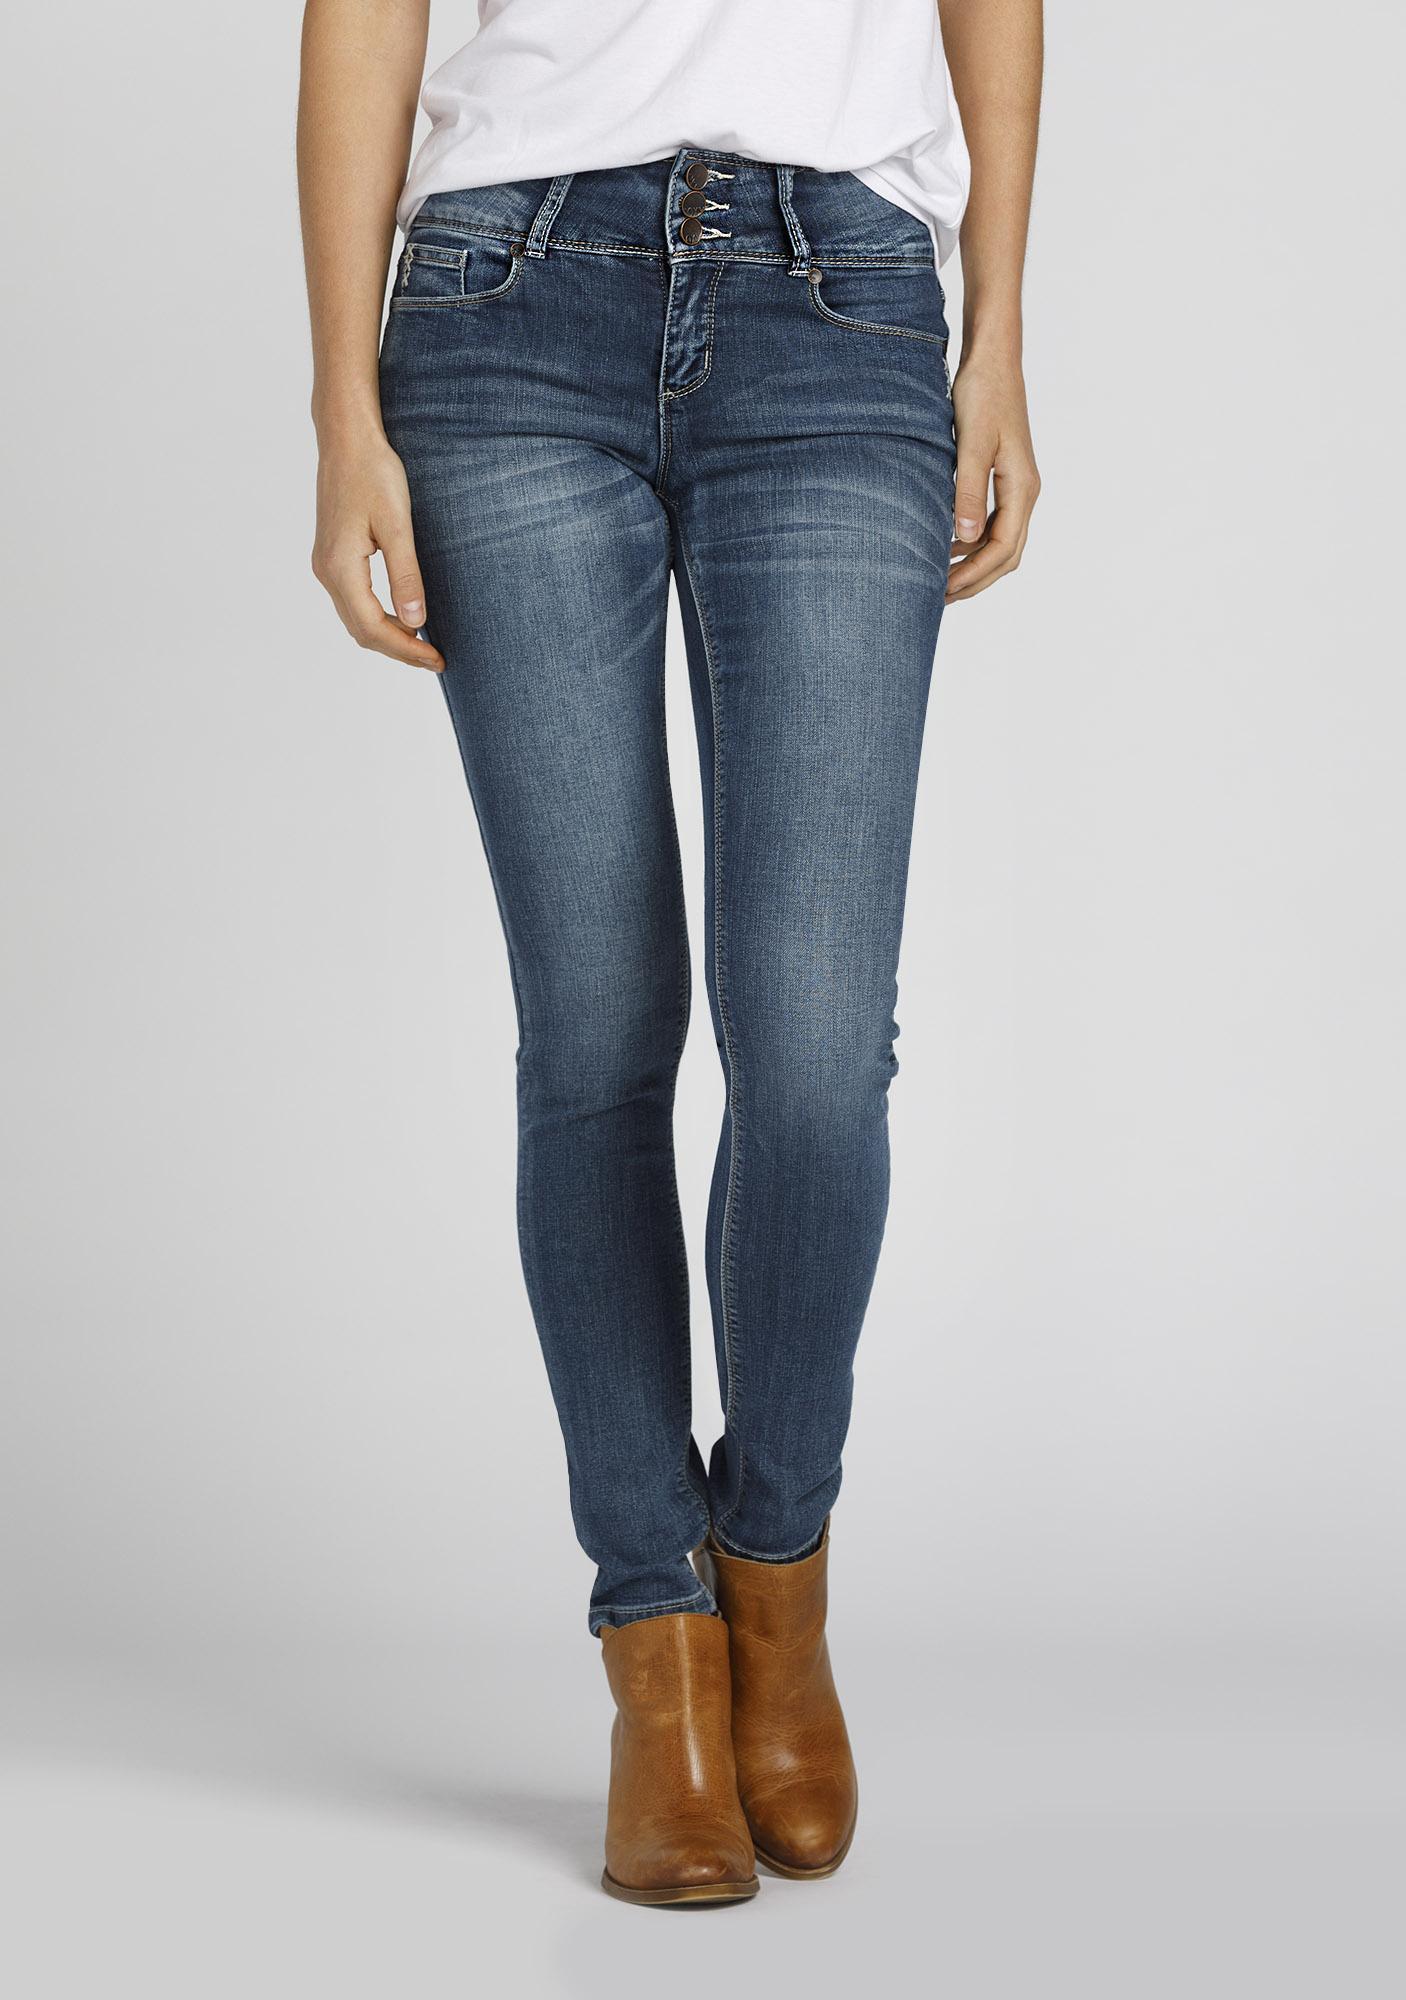 Ladies high rise skinny jeans